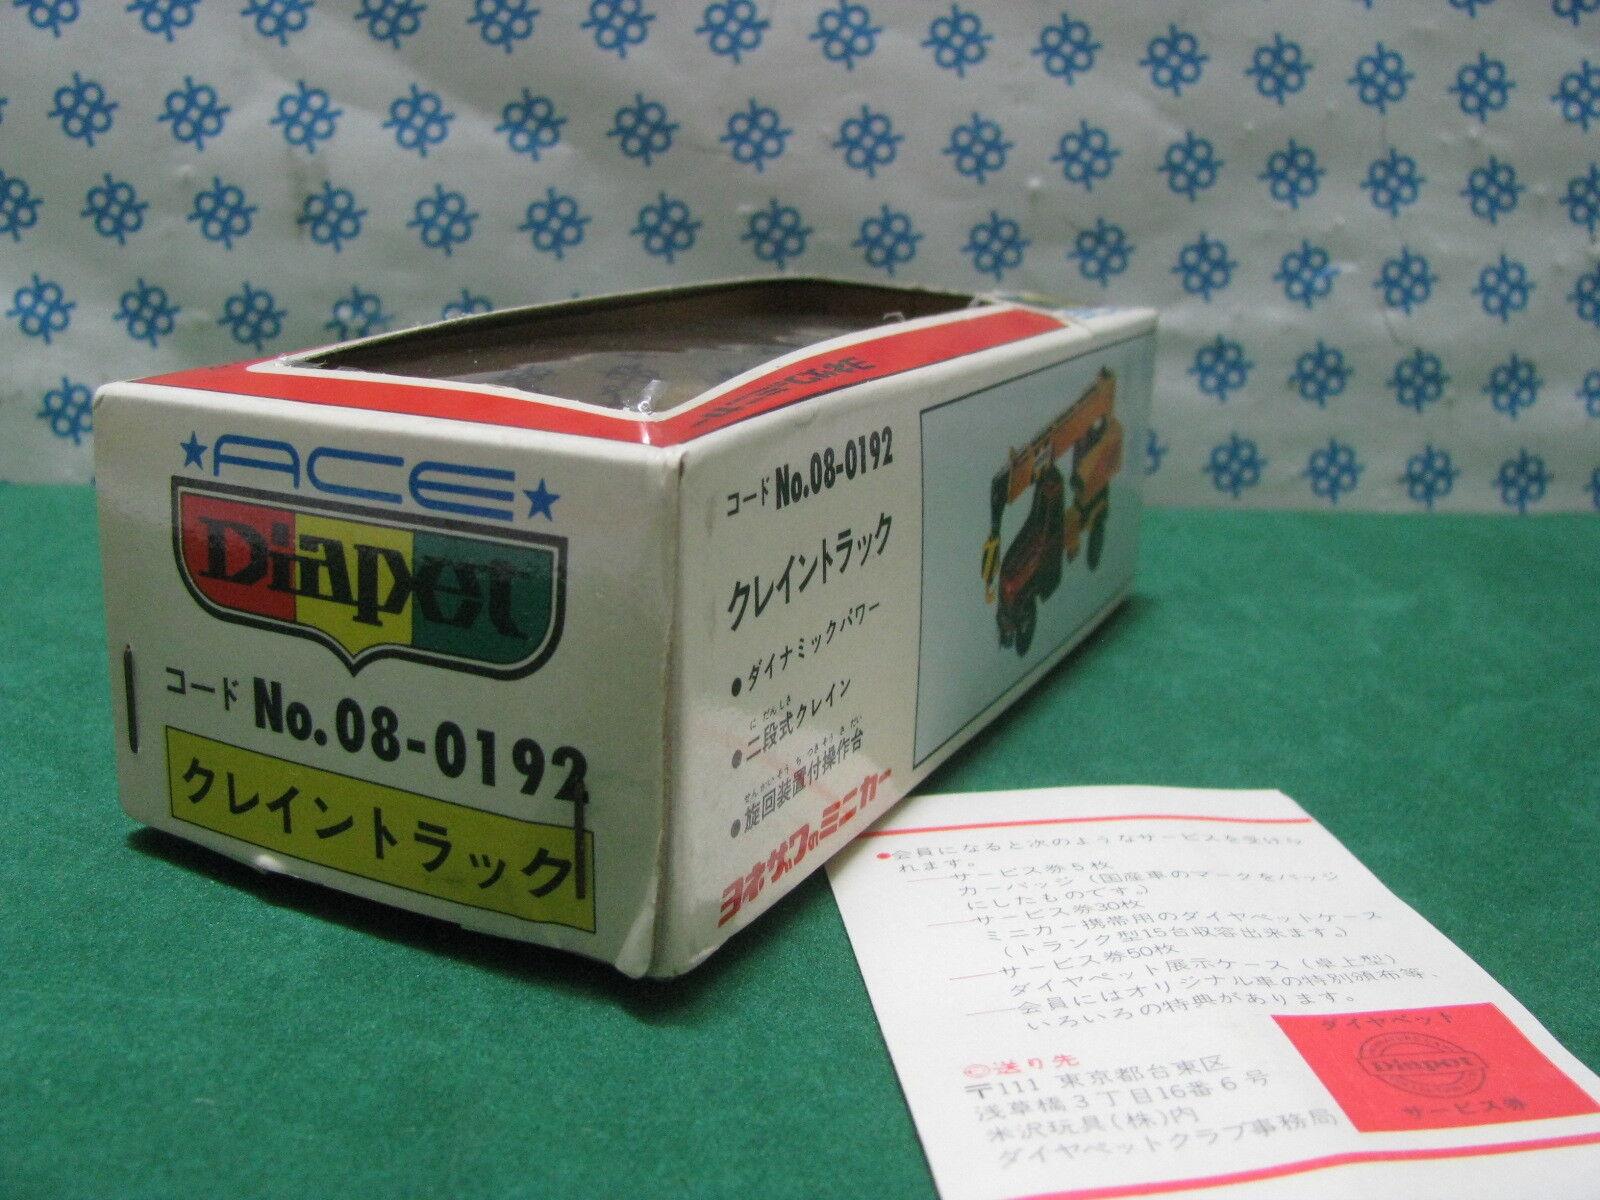 Boite pour   Empty Boîte pour Camion Crane - 1 56 Diapet - Yonezawa Juguetes